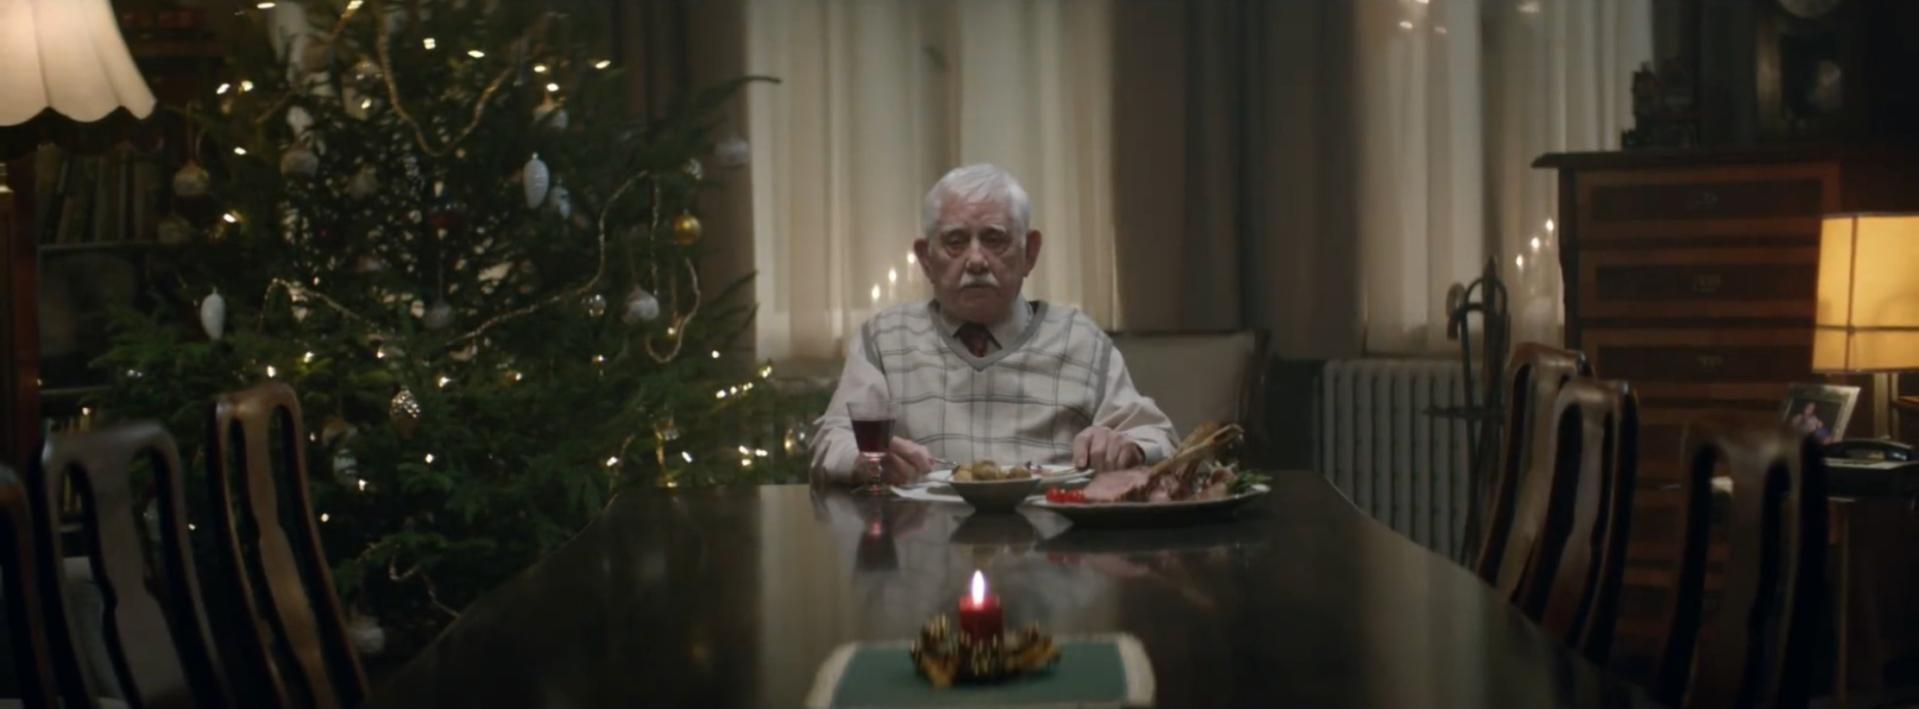 Holidays alone by EDEKA